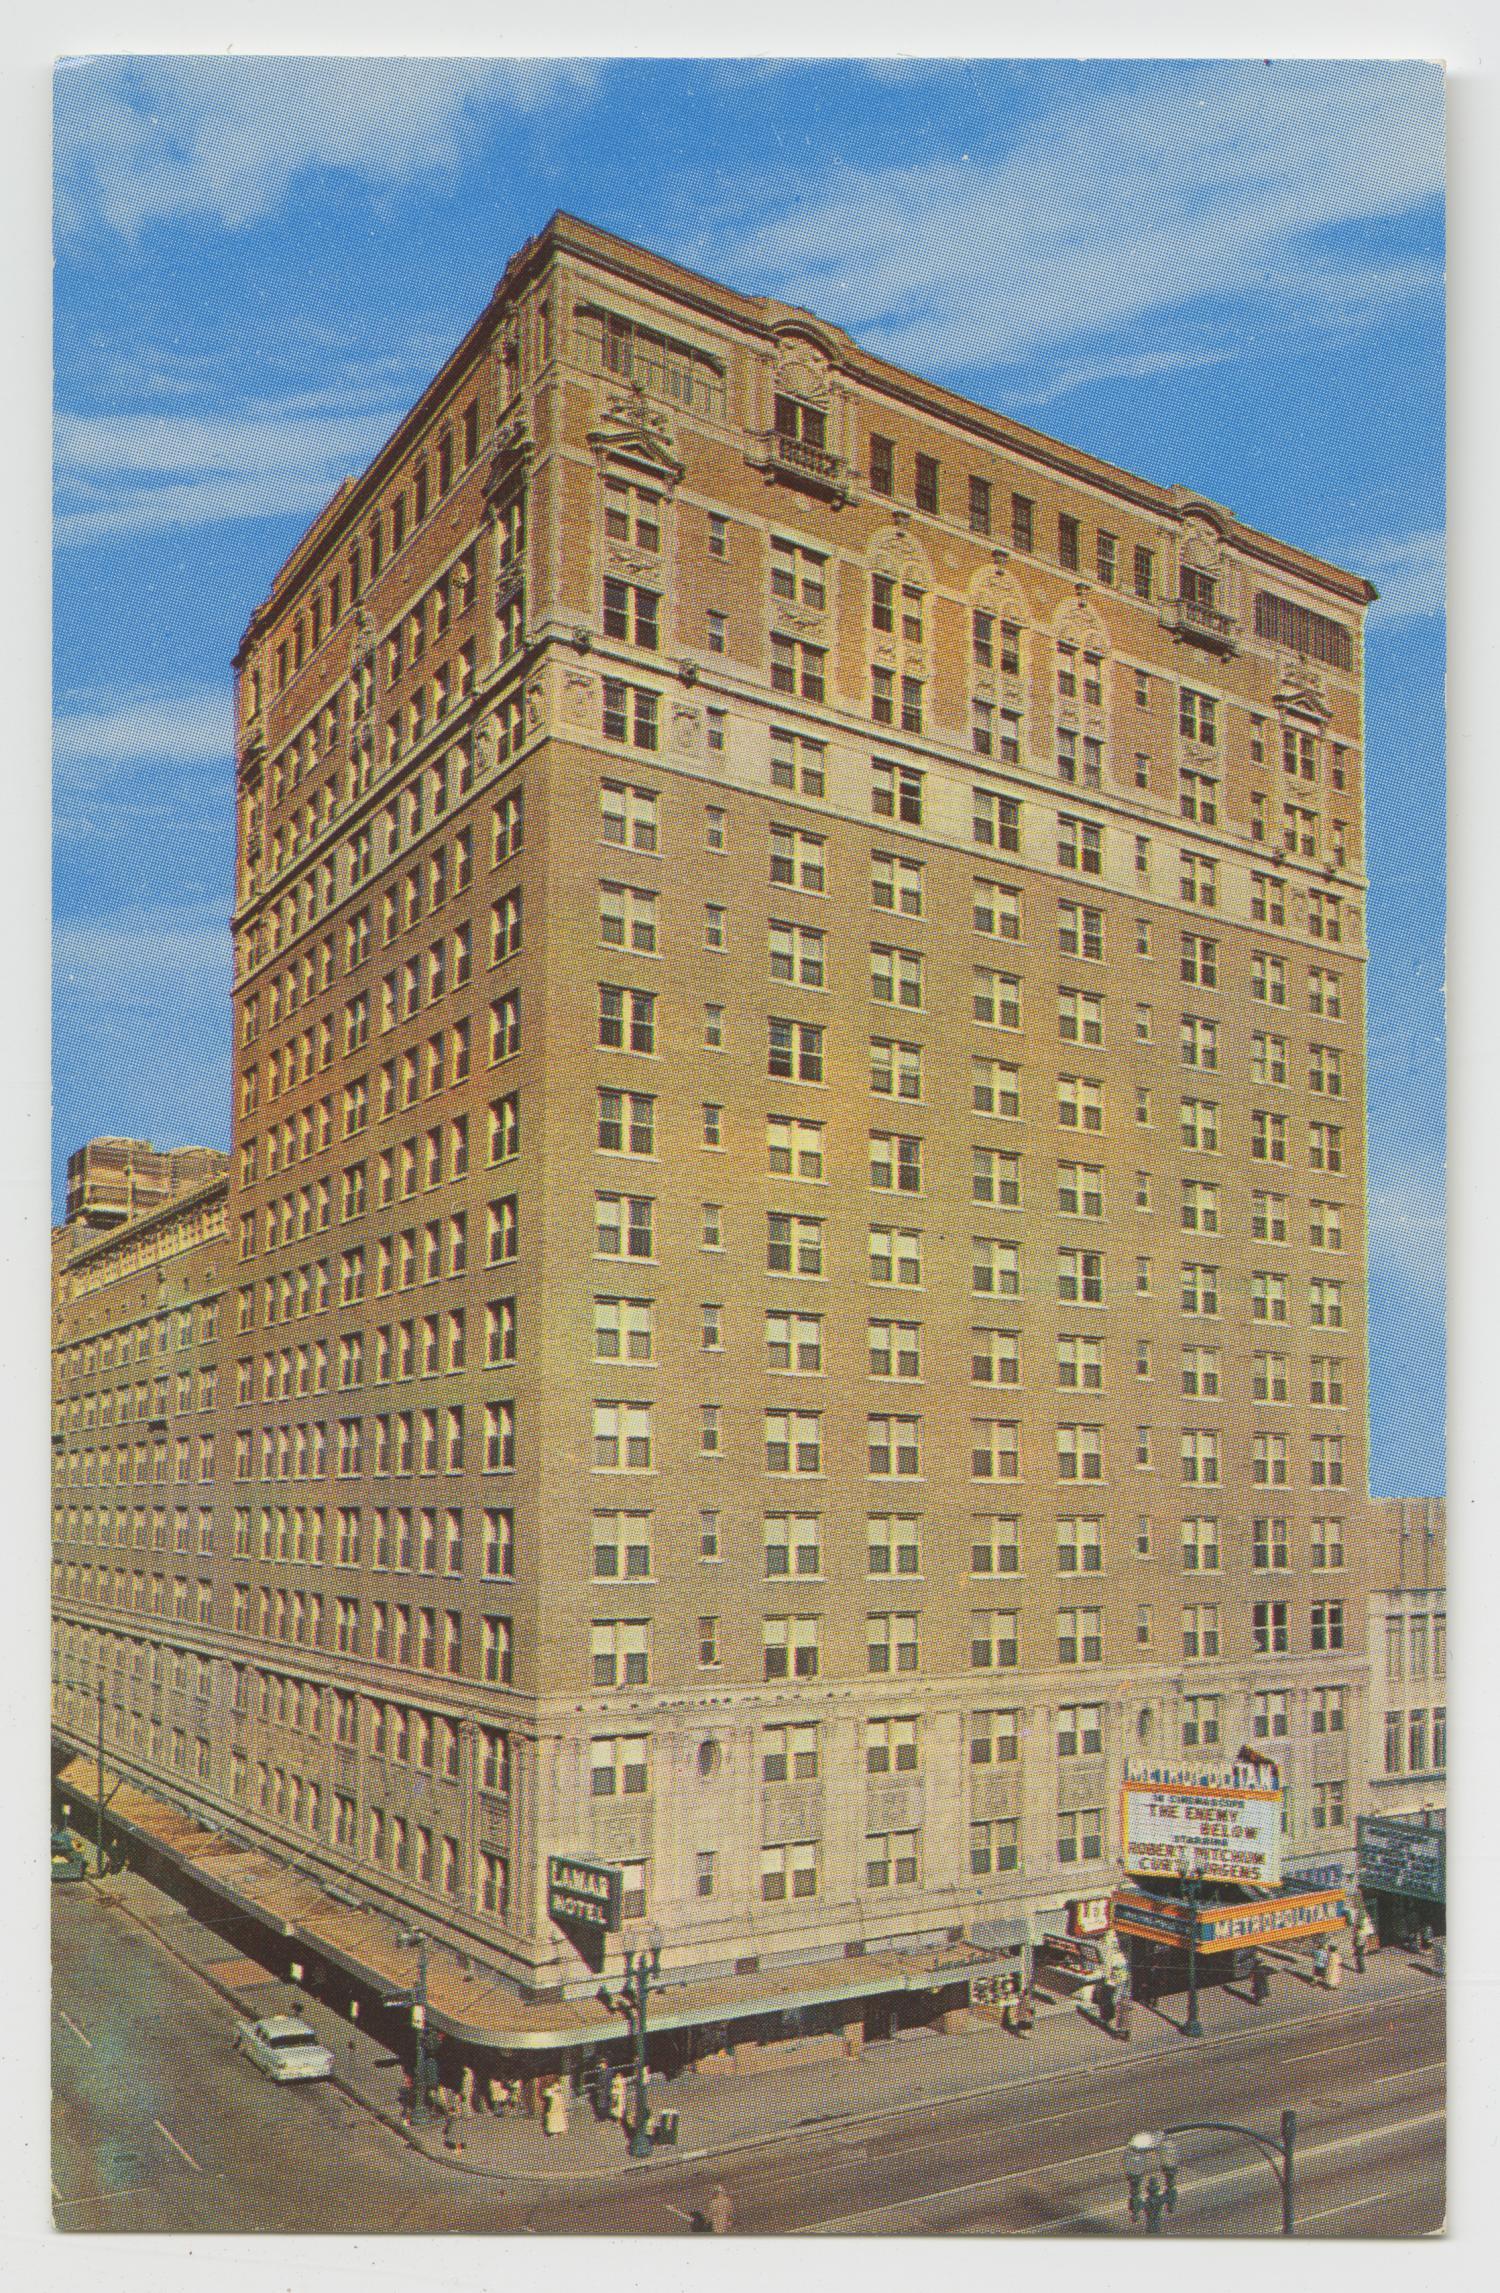 The Lamar Hotel, 1950s